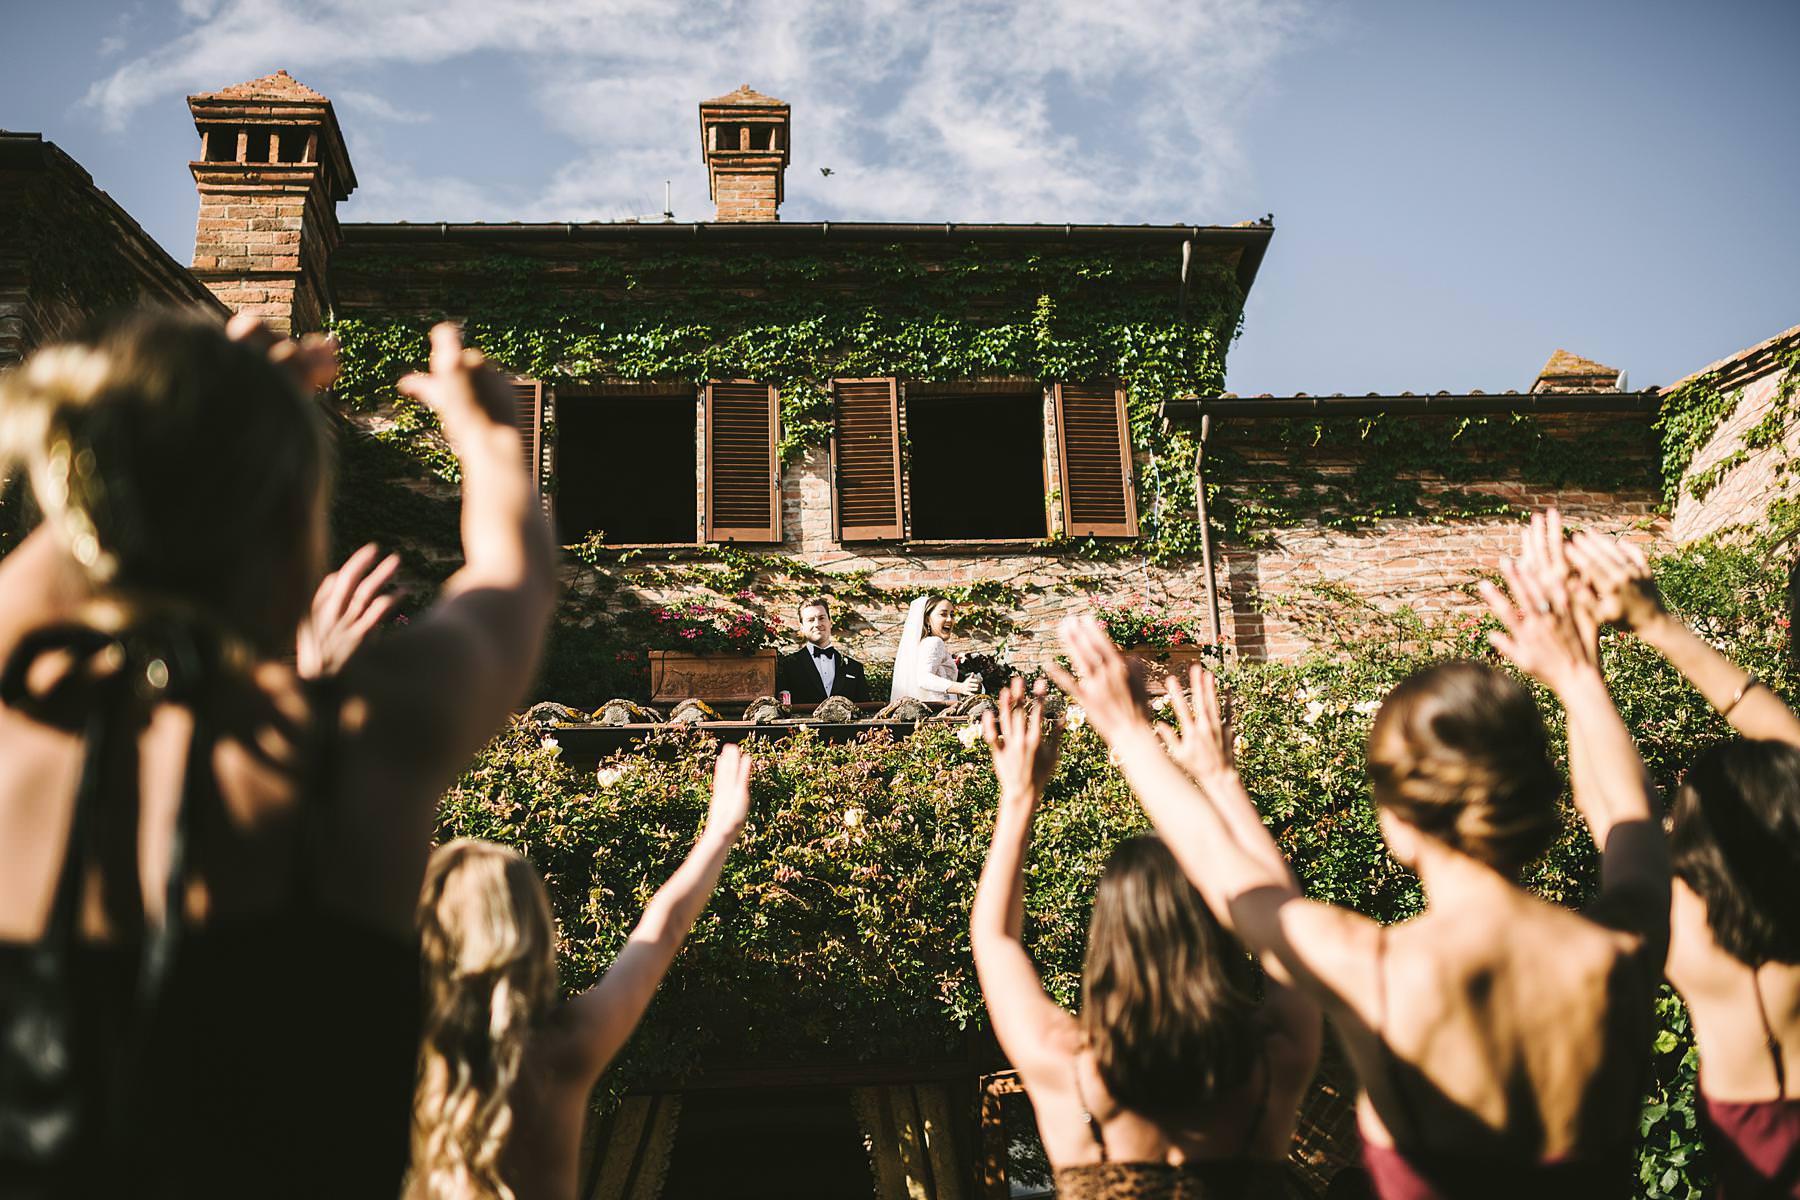 Exciting fun and elegant intimate destination wedding in Umbria at historic incredible venue Villa l'Antica Posta